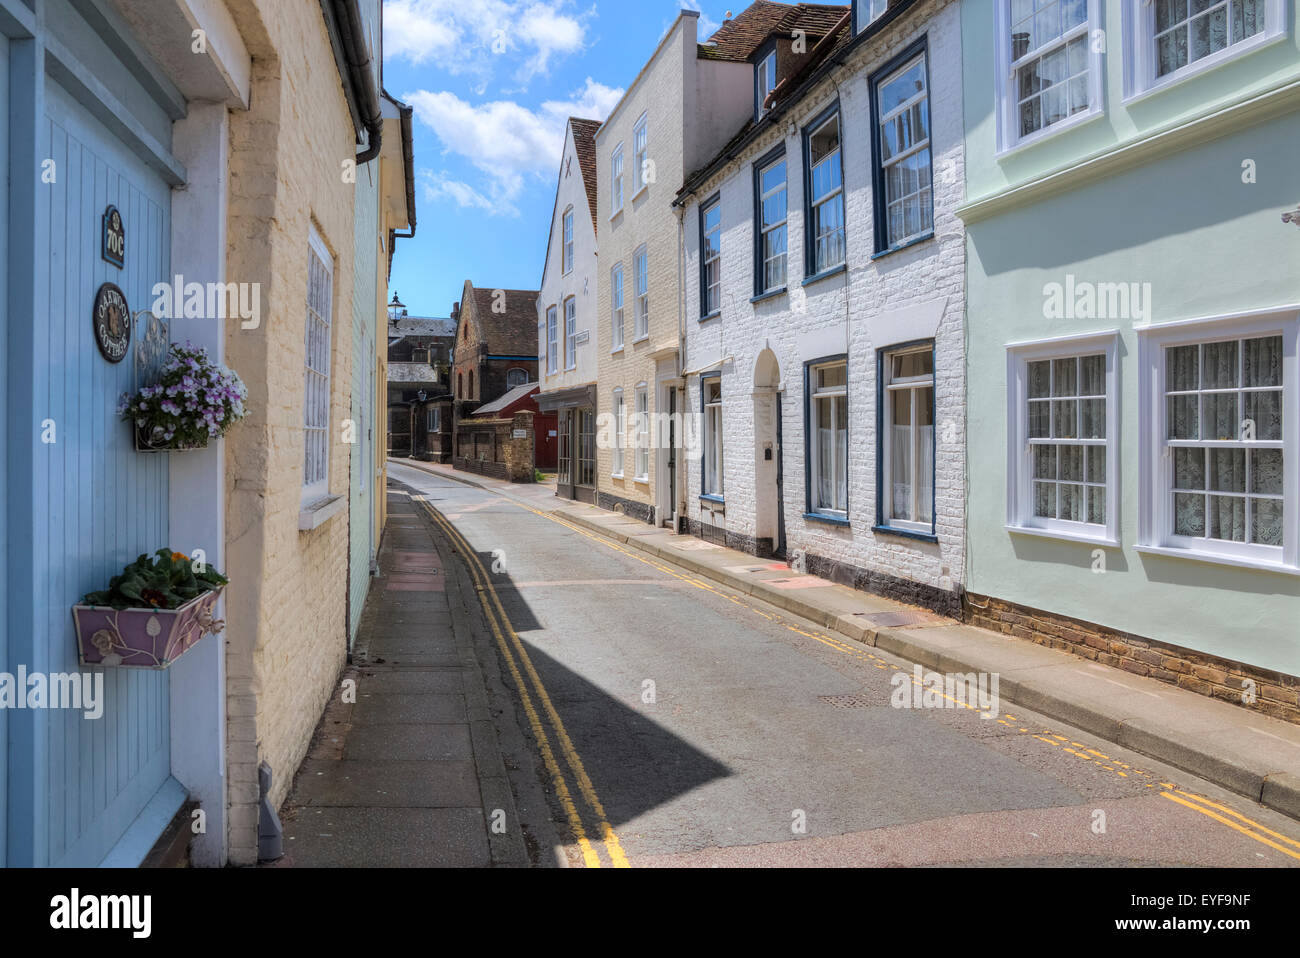 Deal, Kent, England, United Kingdom - Stock Image